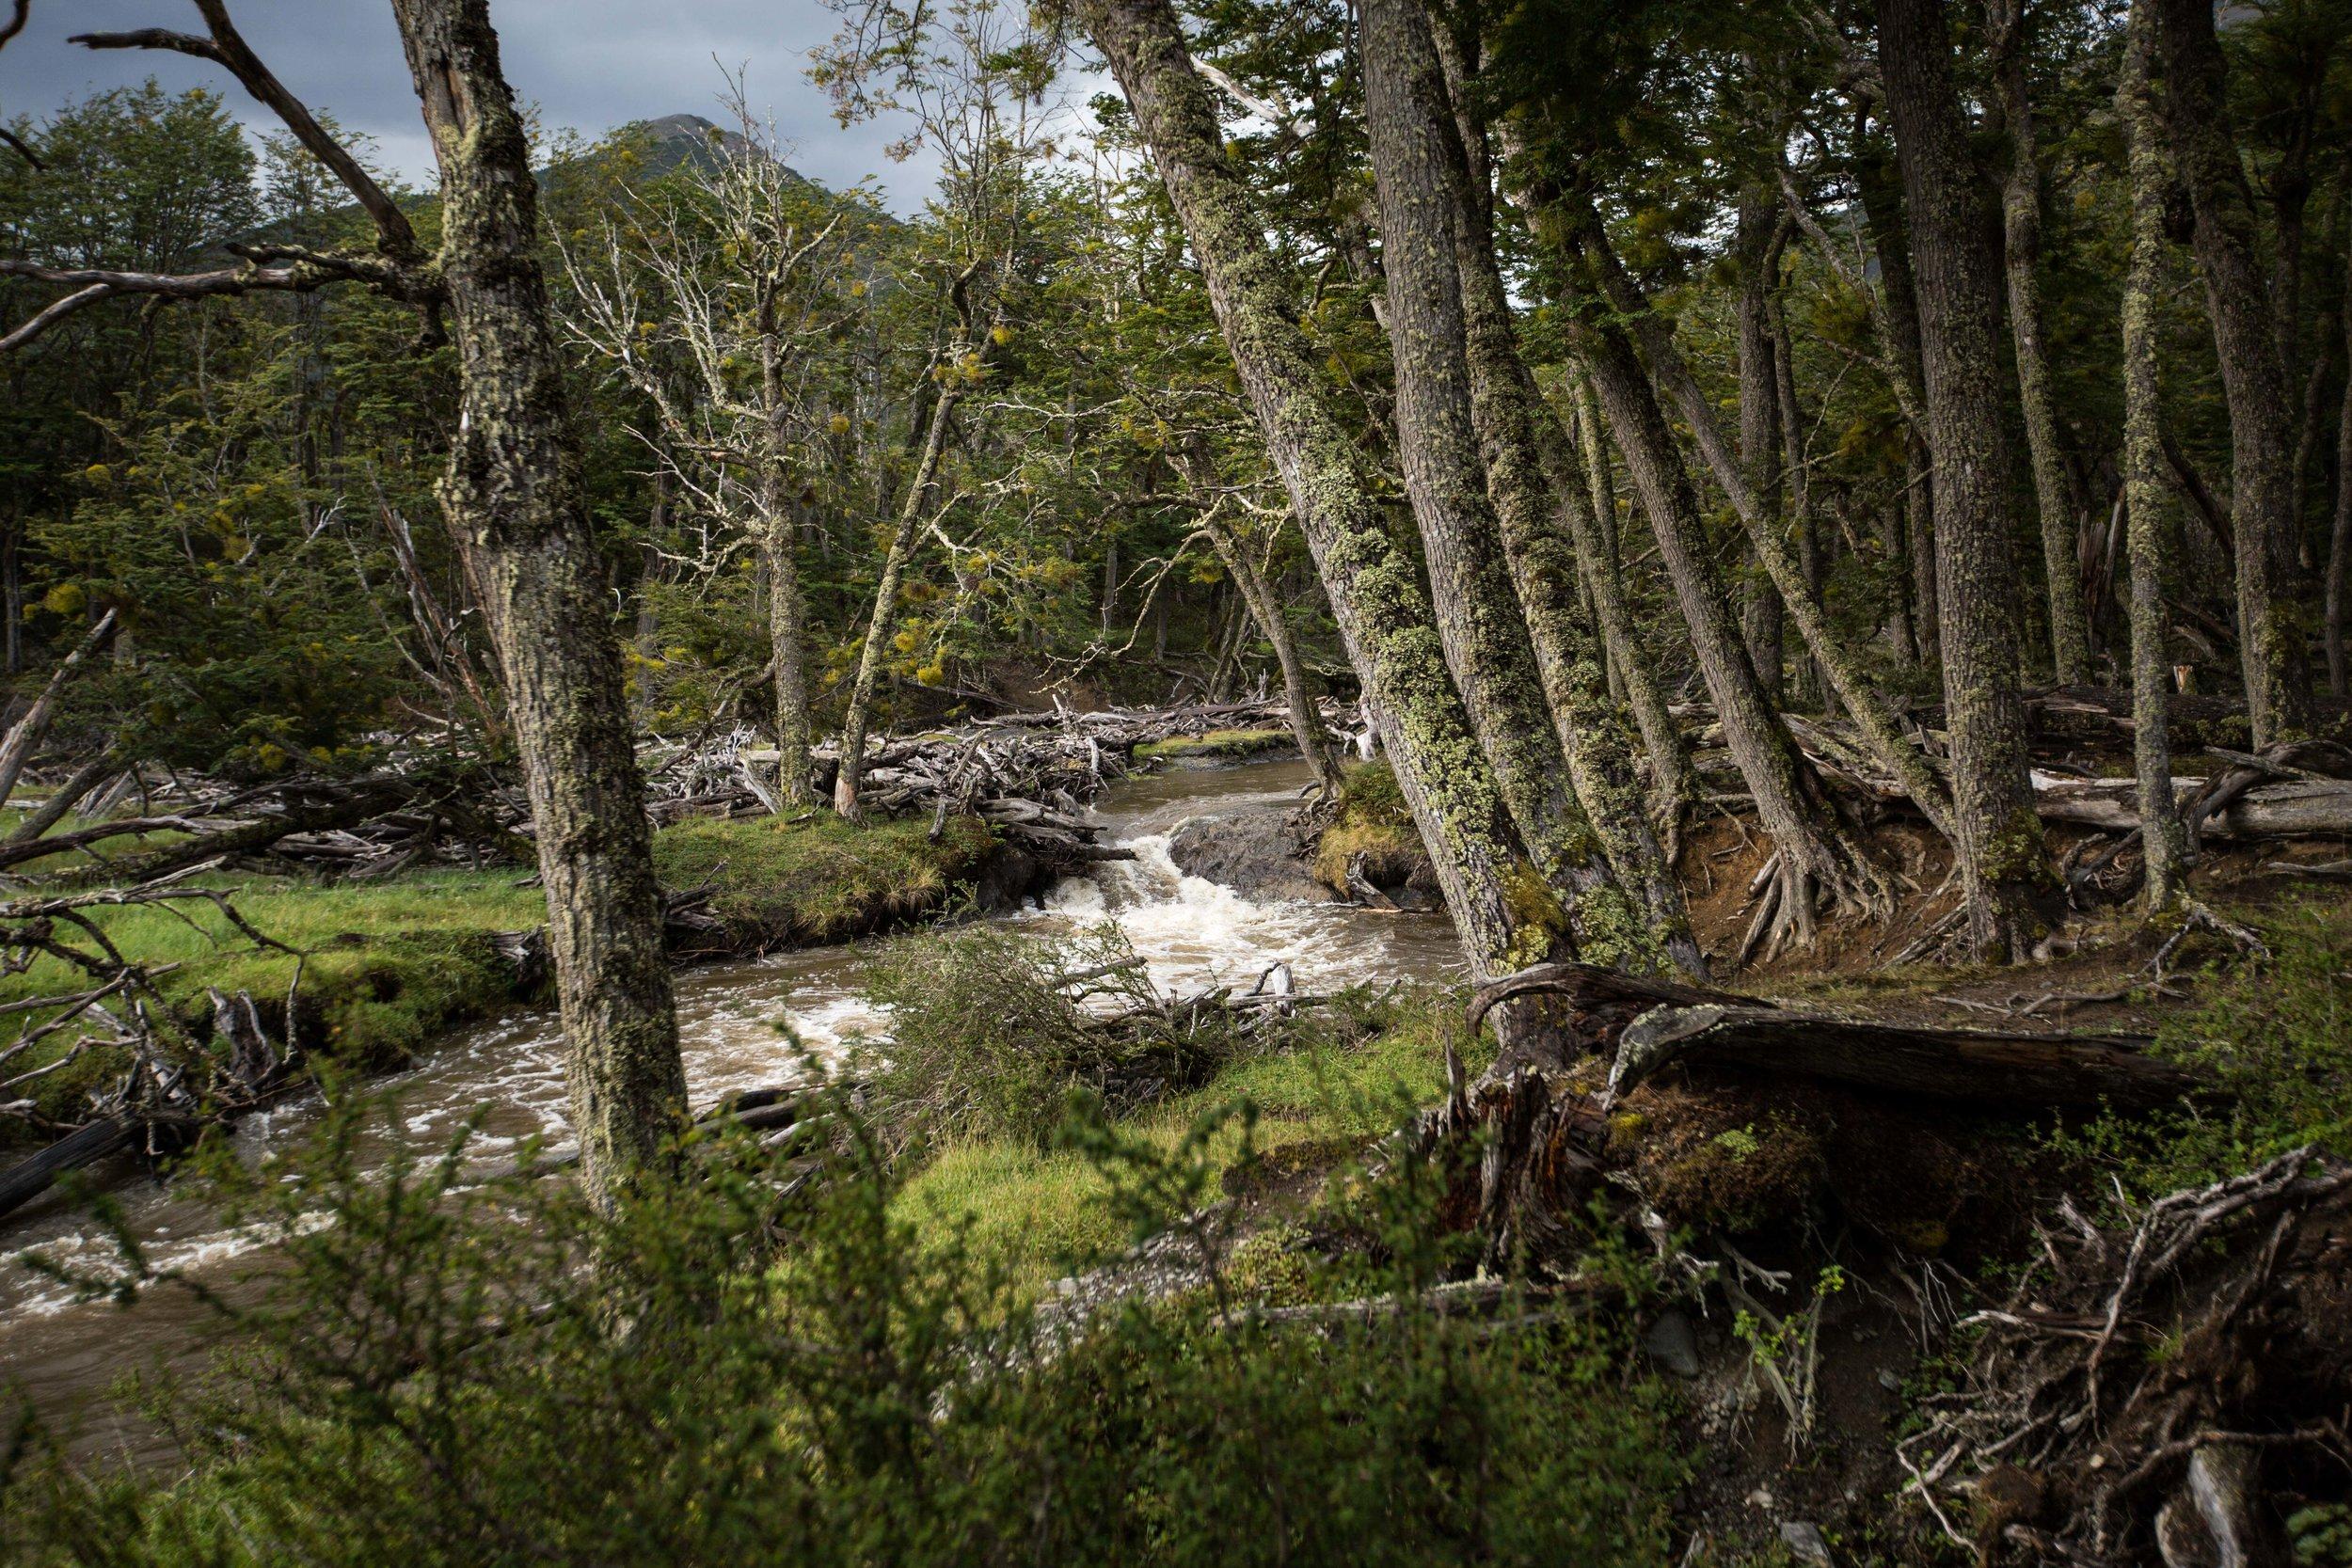 The green, lush landscape inside Karukinka Park, Tierra del Fuego